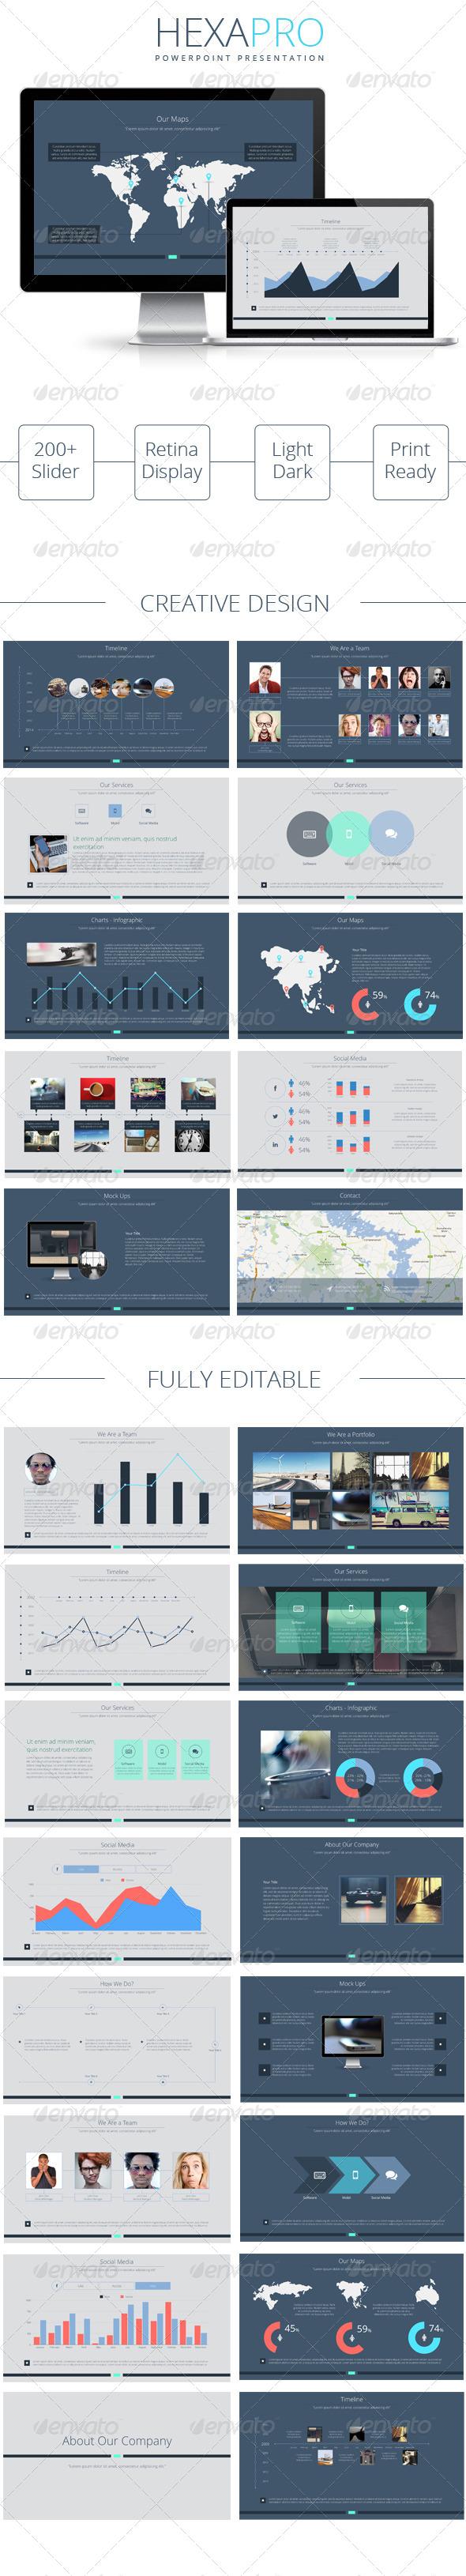 GraphicRiver HexaPro Creative PowerPoint Presentation 7812824